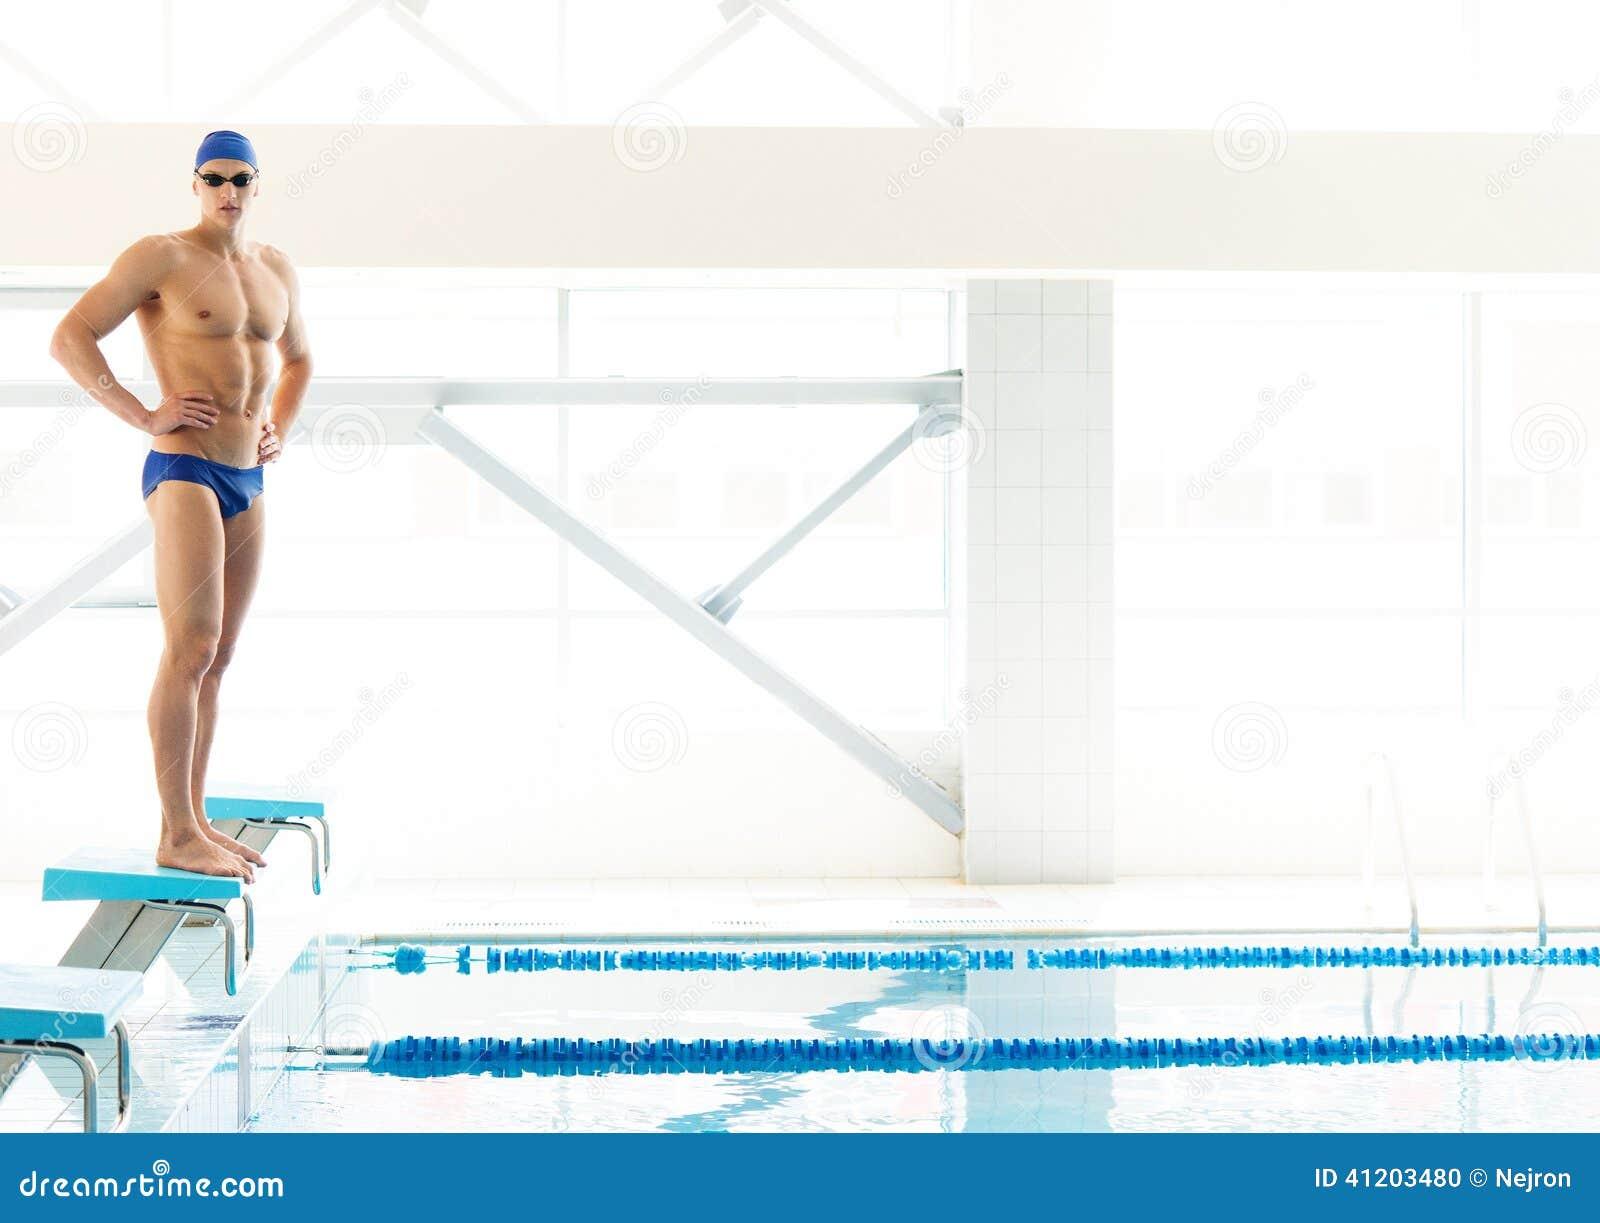 Swimmer Standing On Starting Block Stock Photo Image 41203480